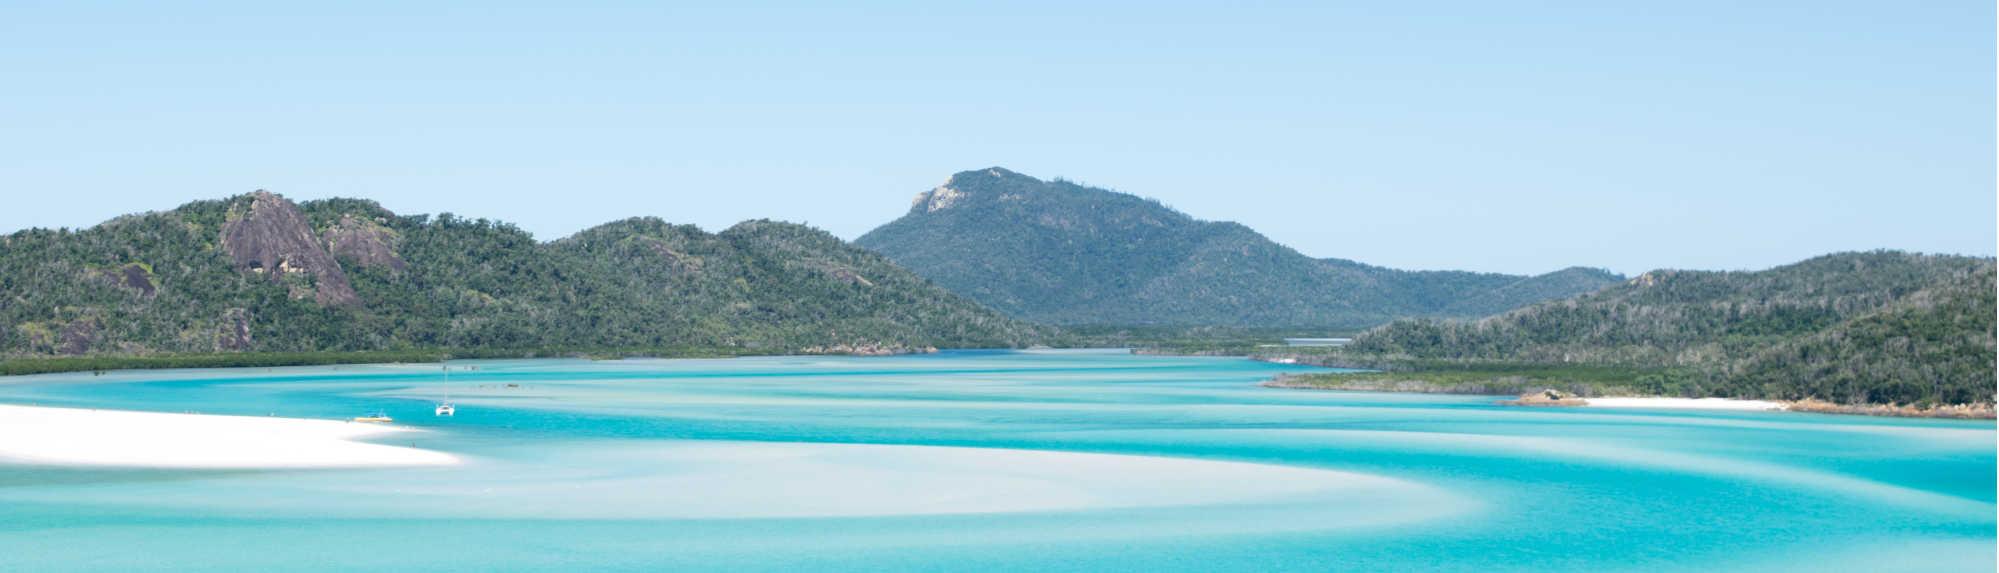 Why Whitehaven Beach is the best beach in Australia